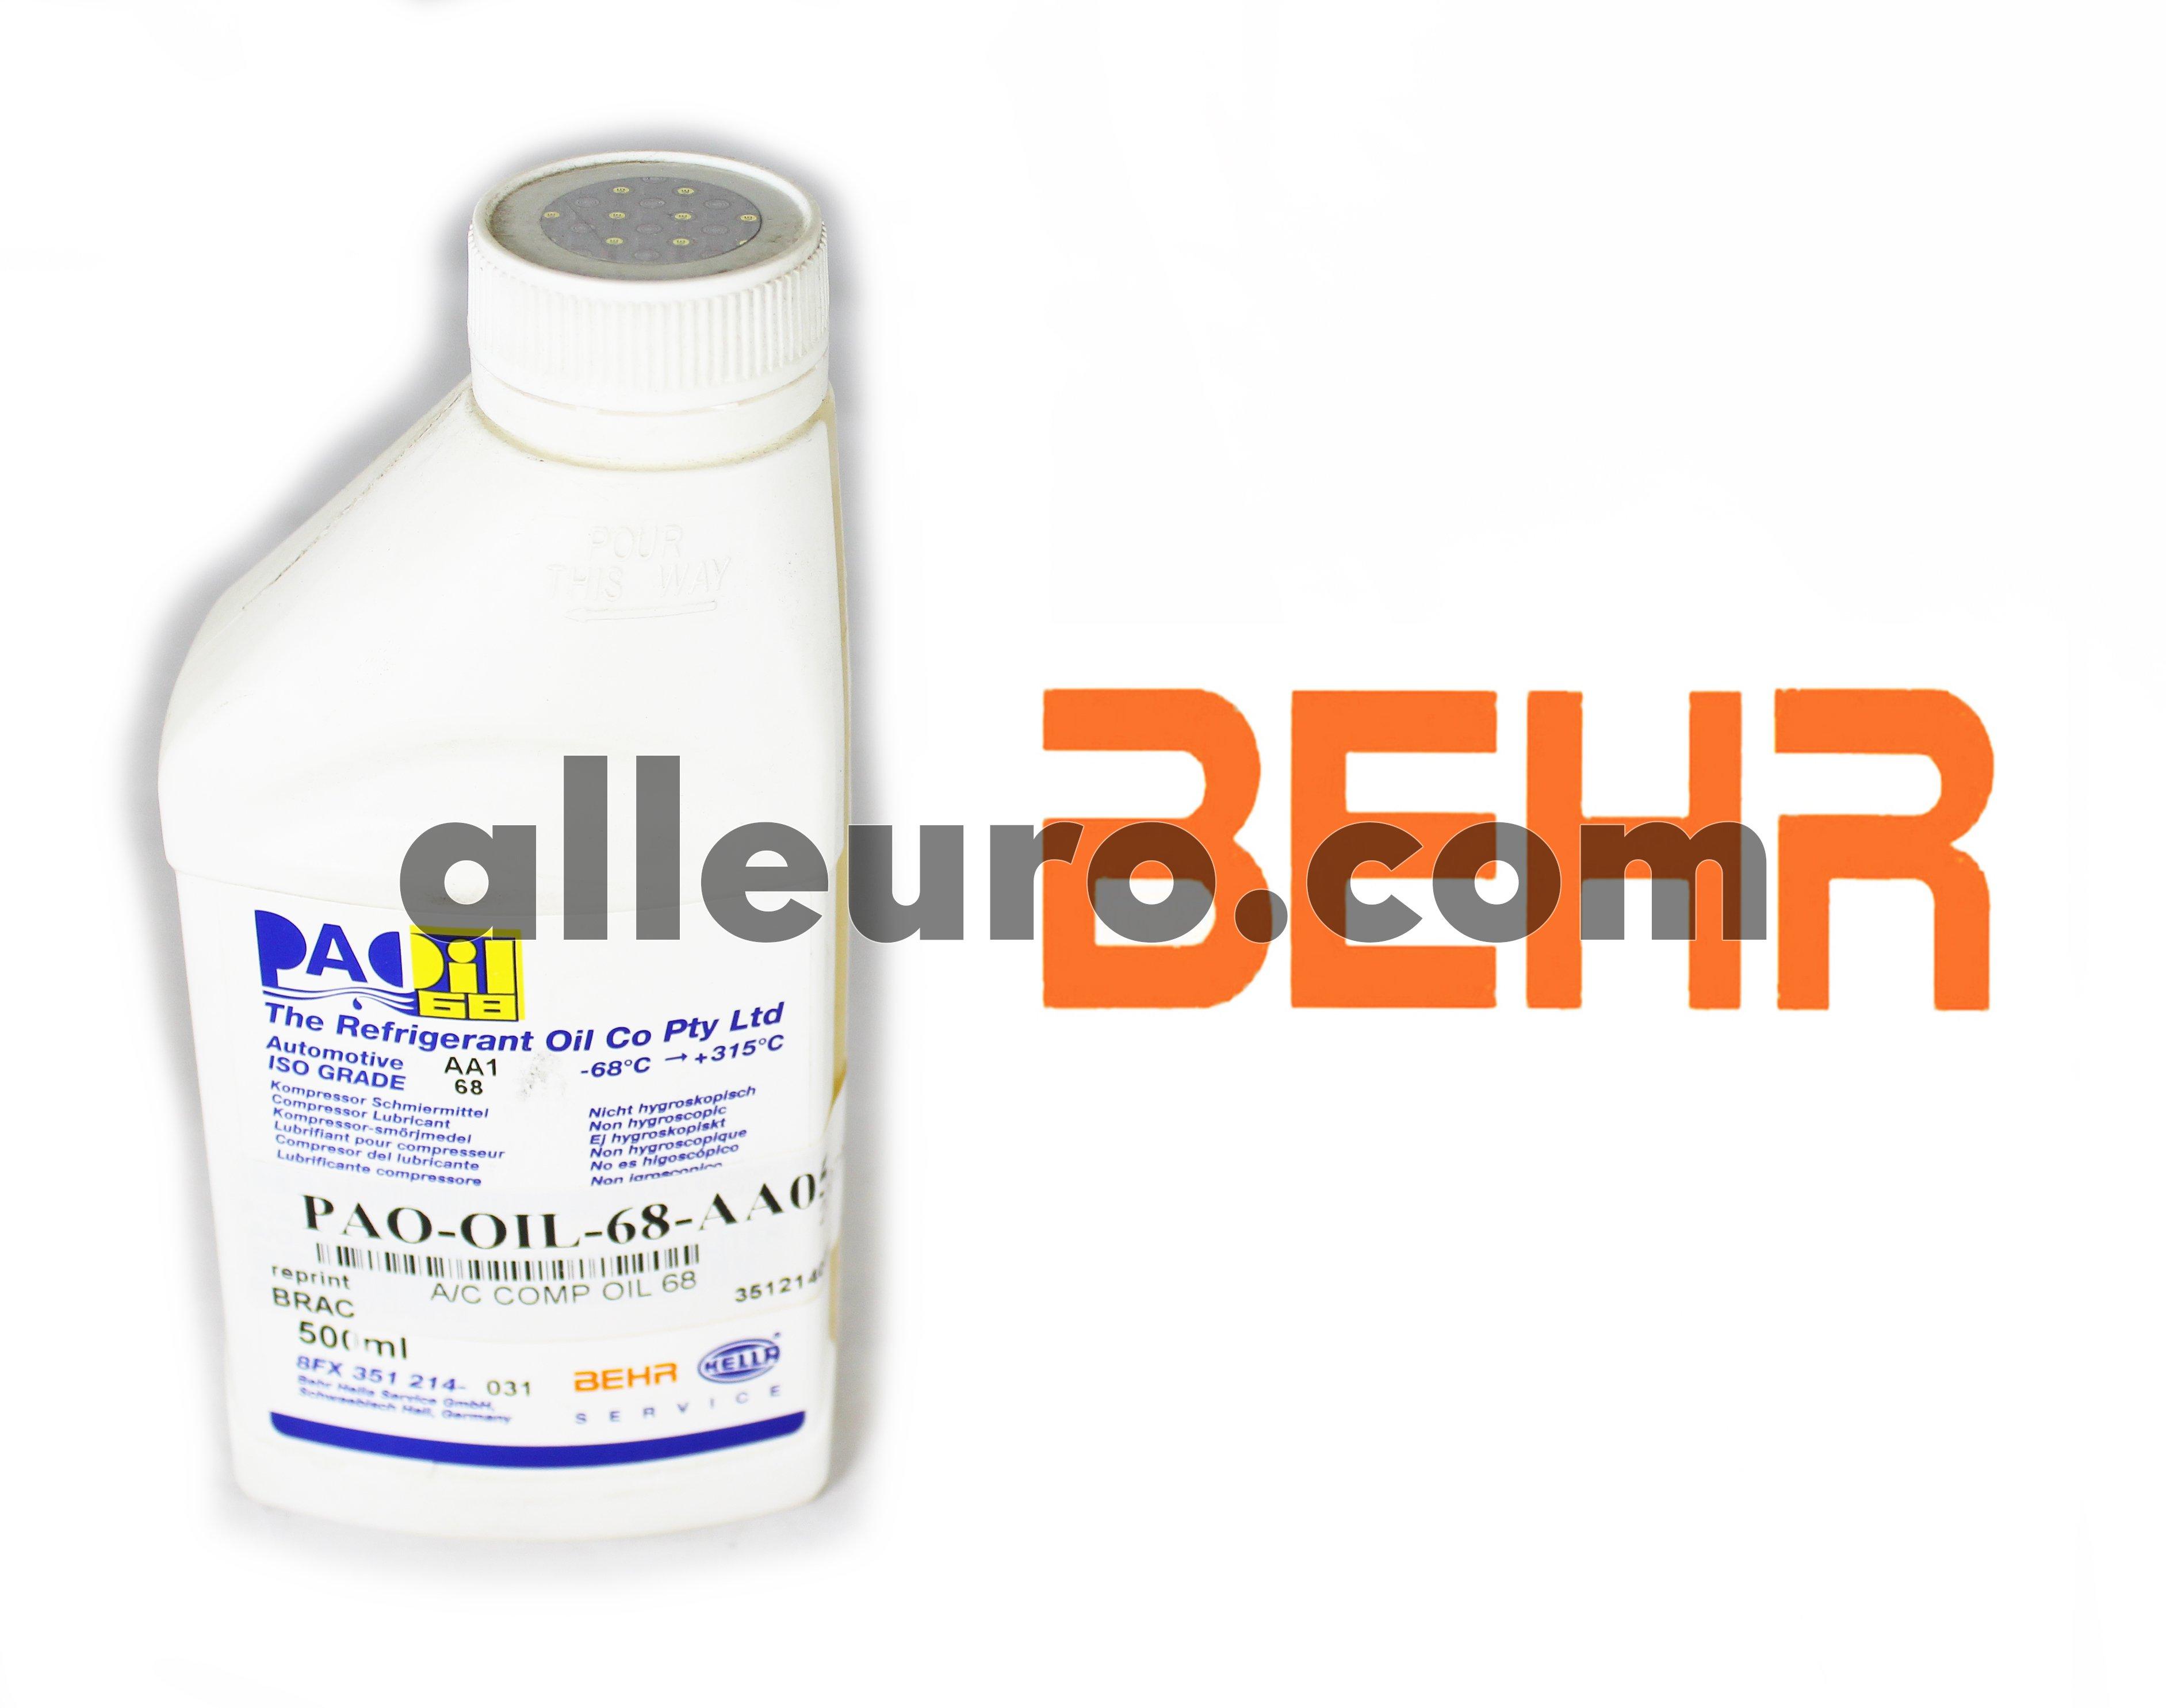 Behr Hella Service A/C compressor oil PAO-OIL-68-AA05 - A/C COMPRESSOR Oil 68 viscocity